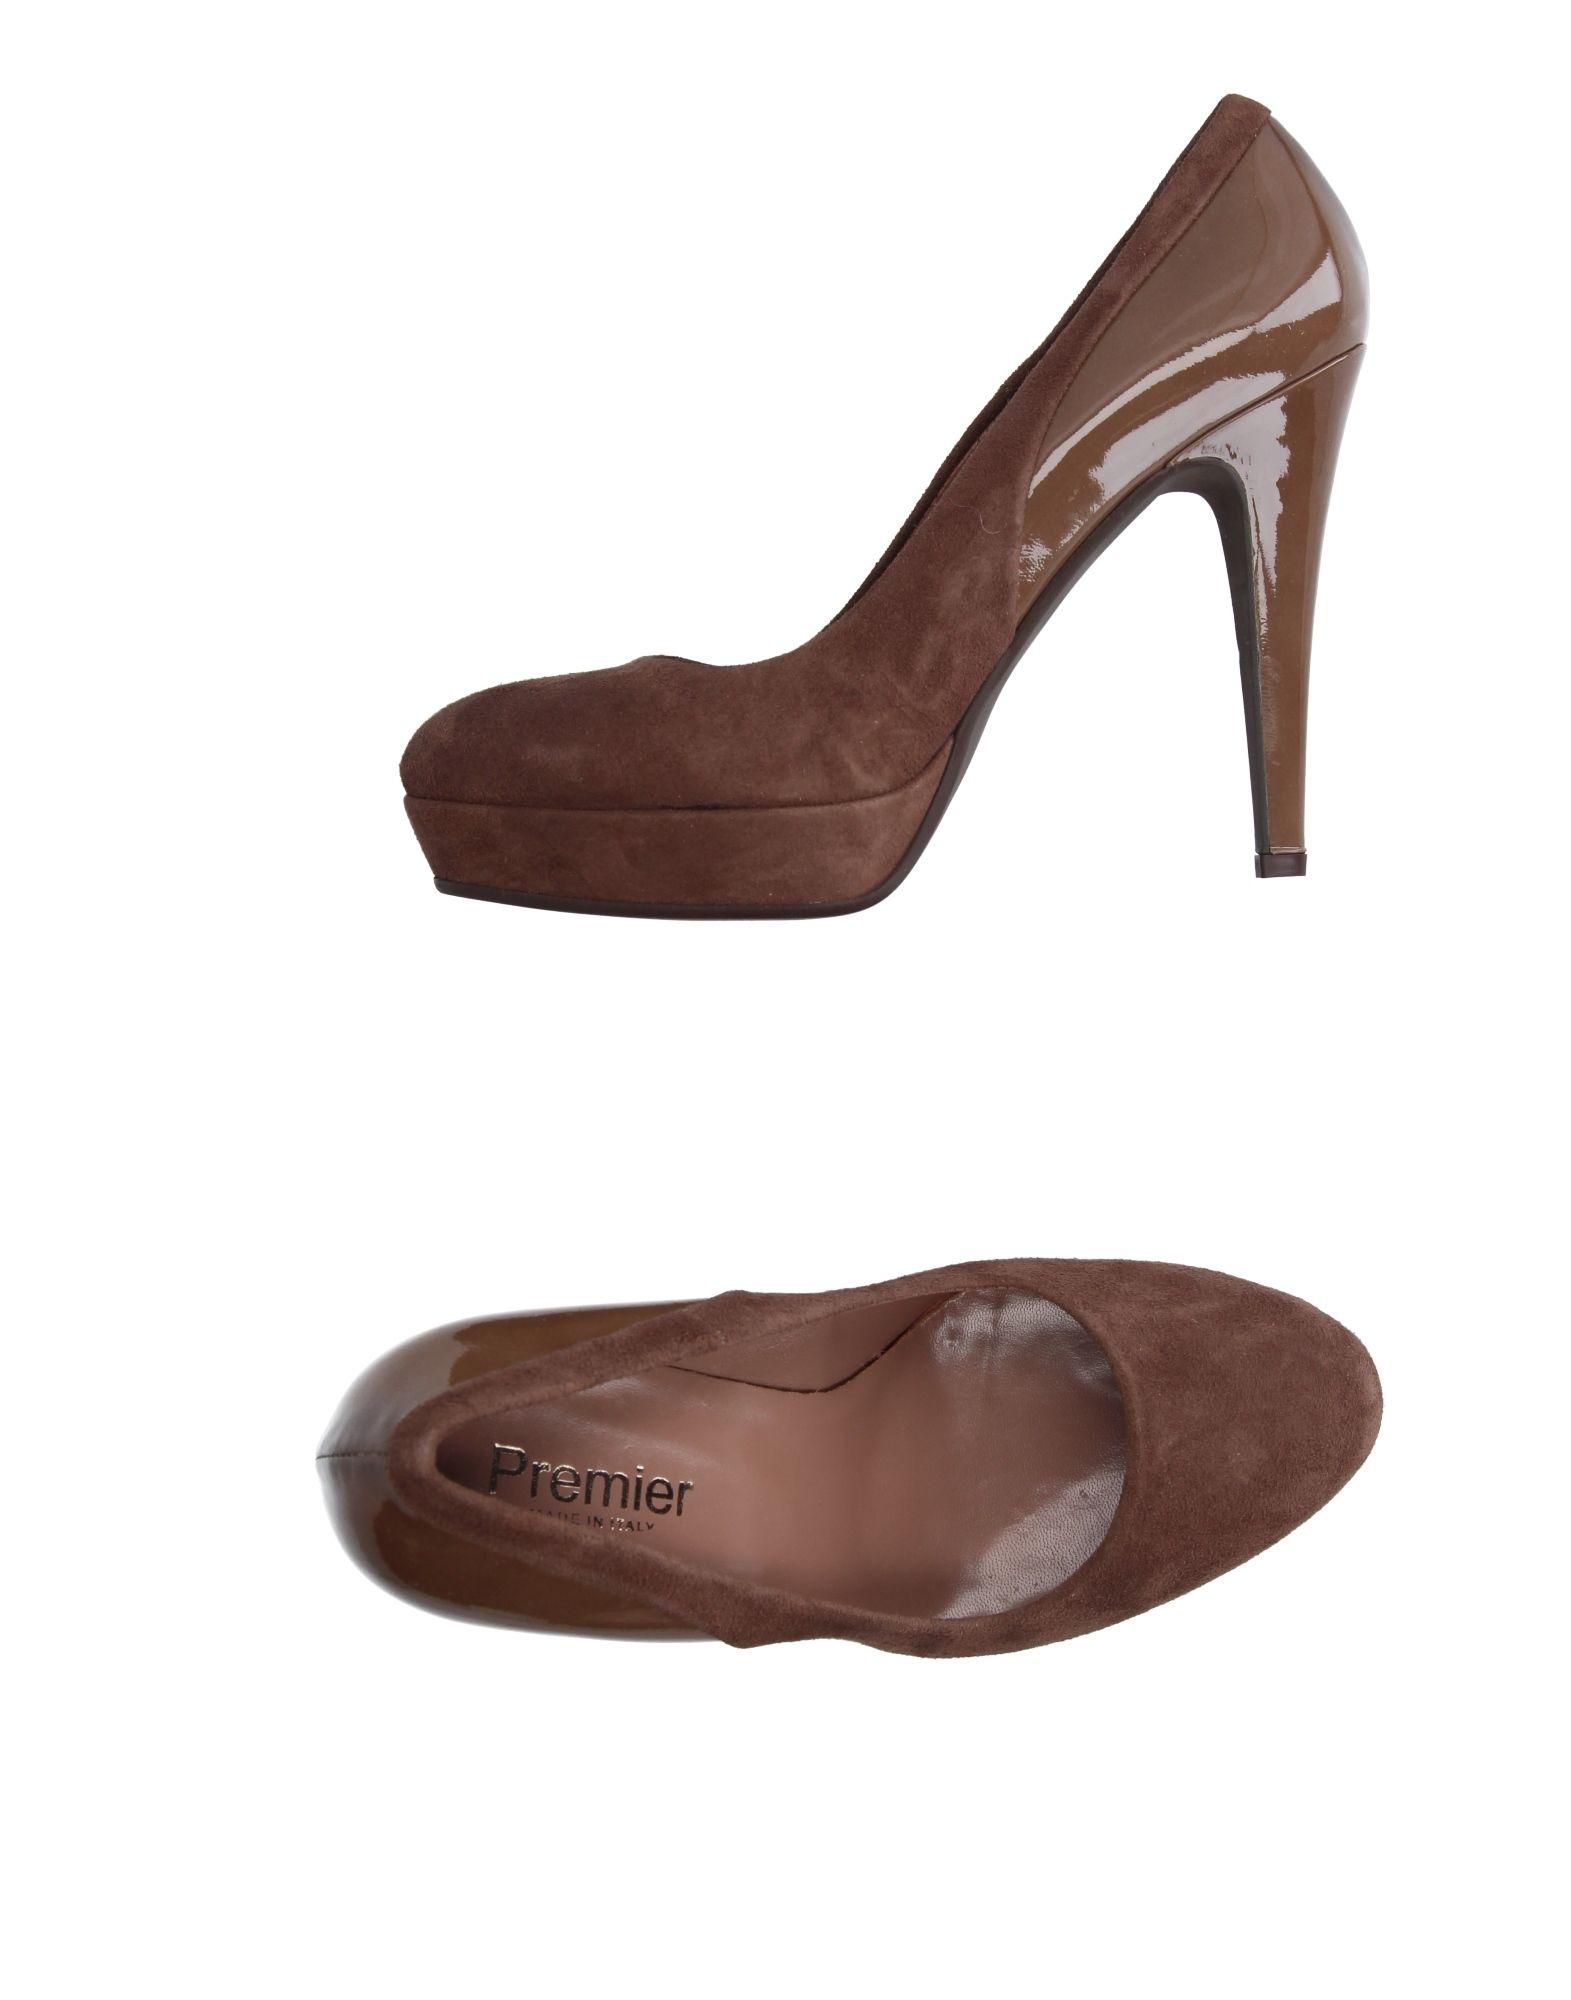 Premier Pumps Damen  11212771KE Gute Qualität beliebte Schuhe